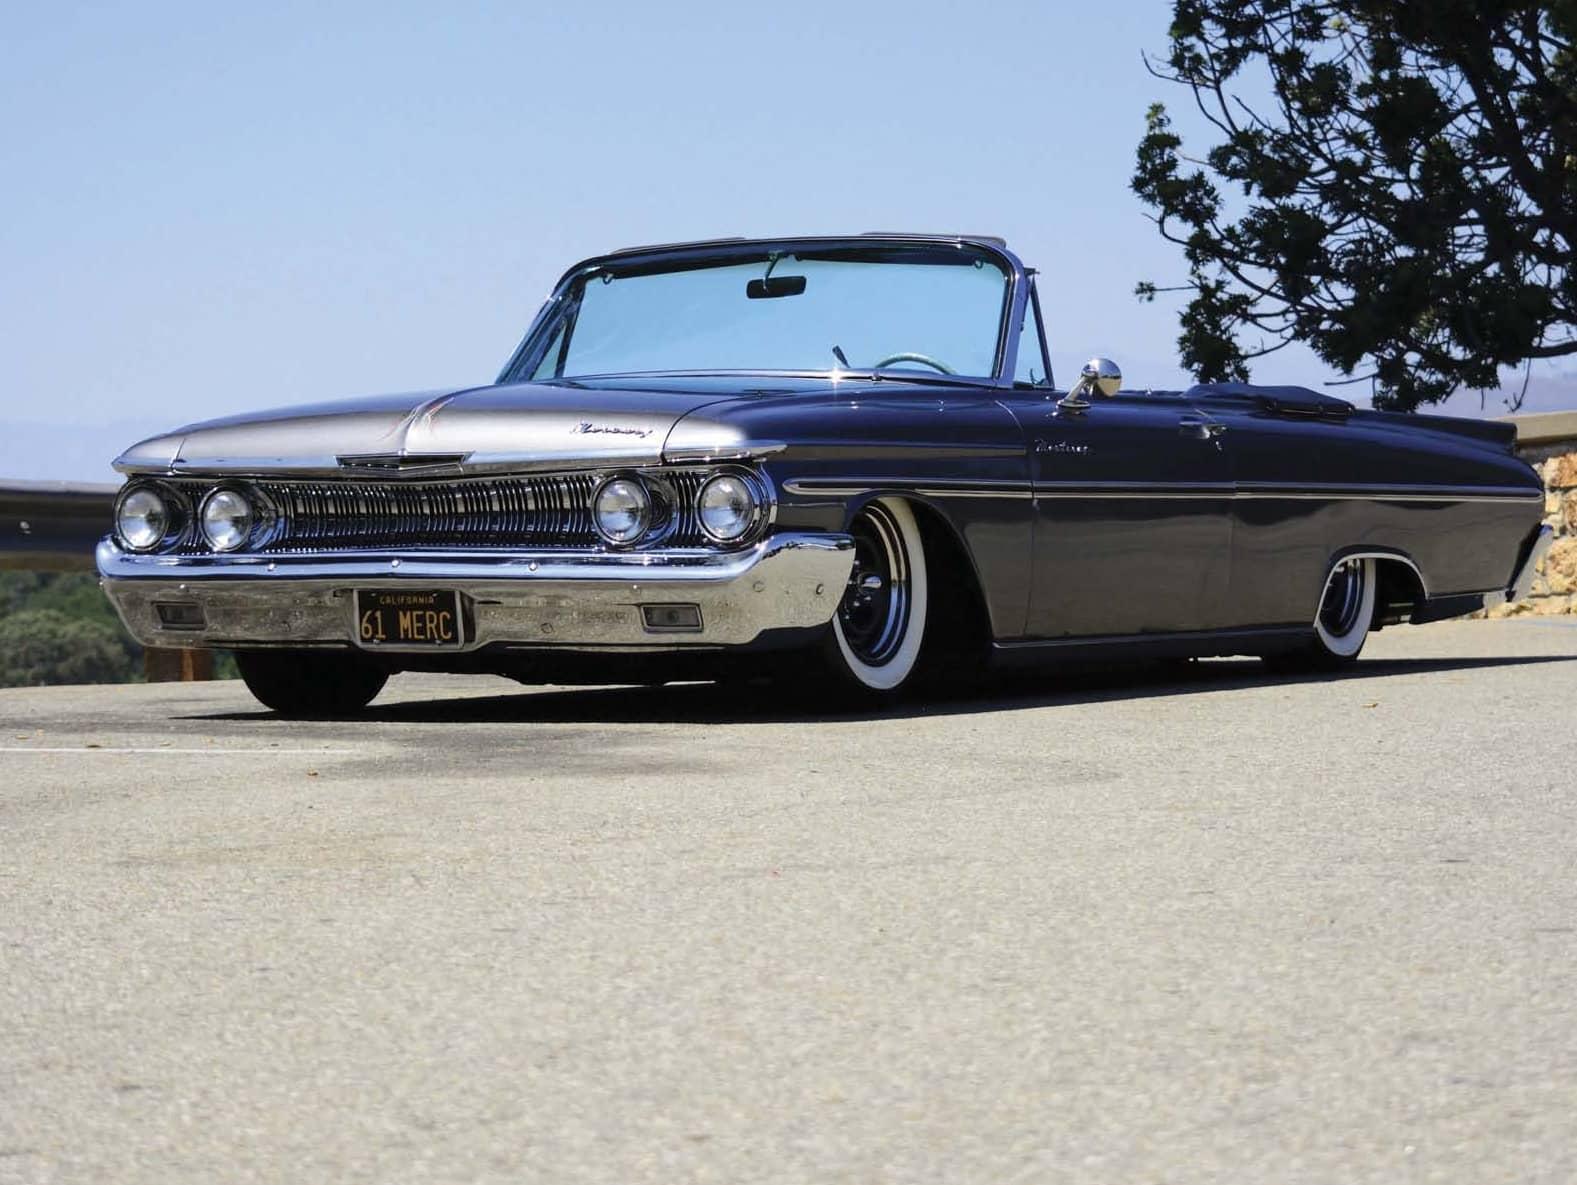 One Sweet '61